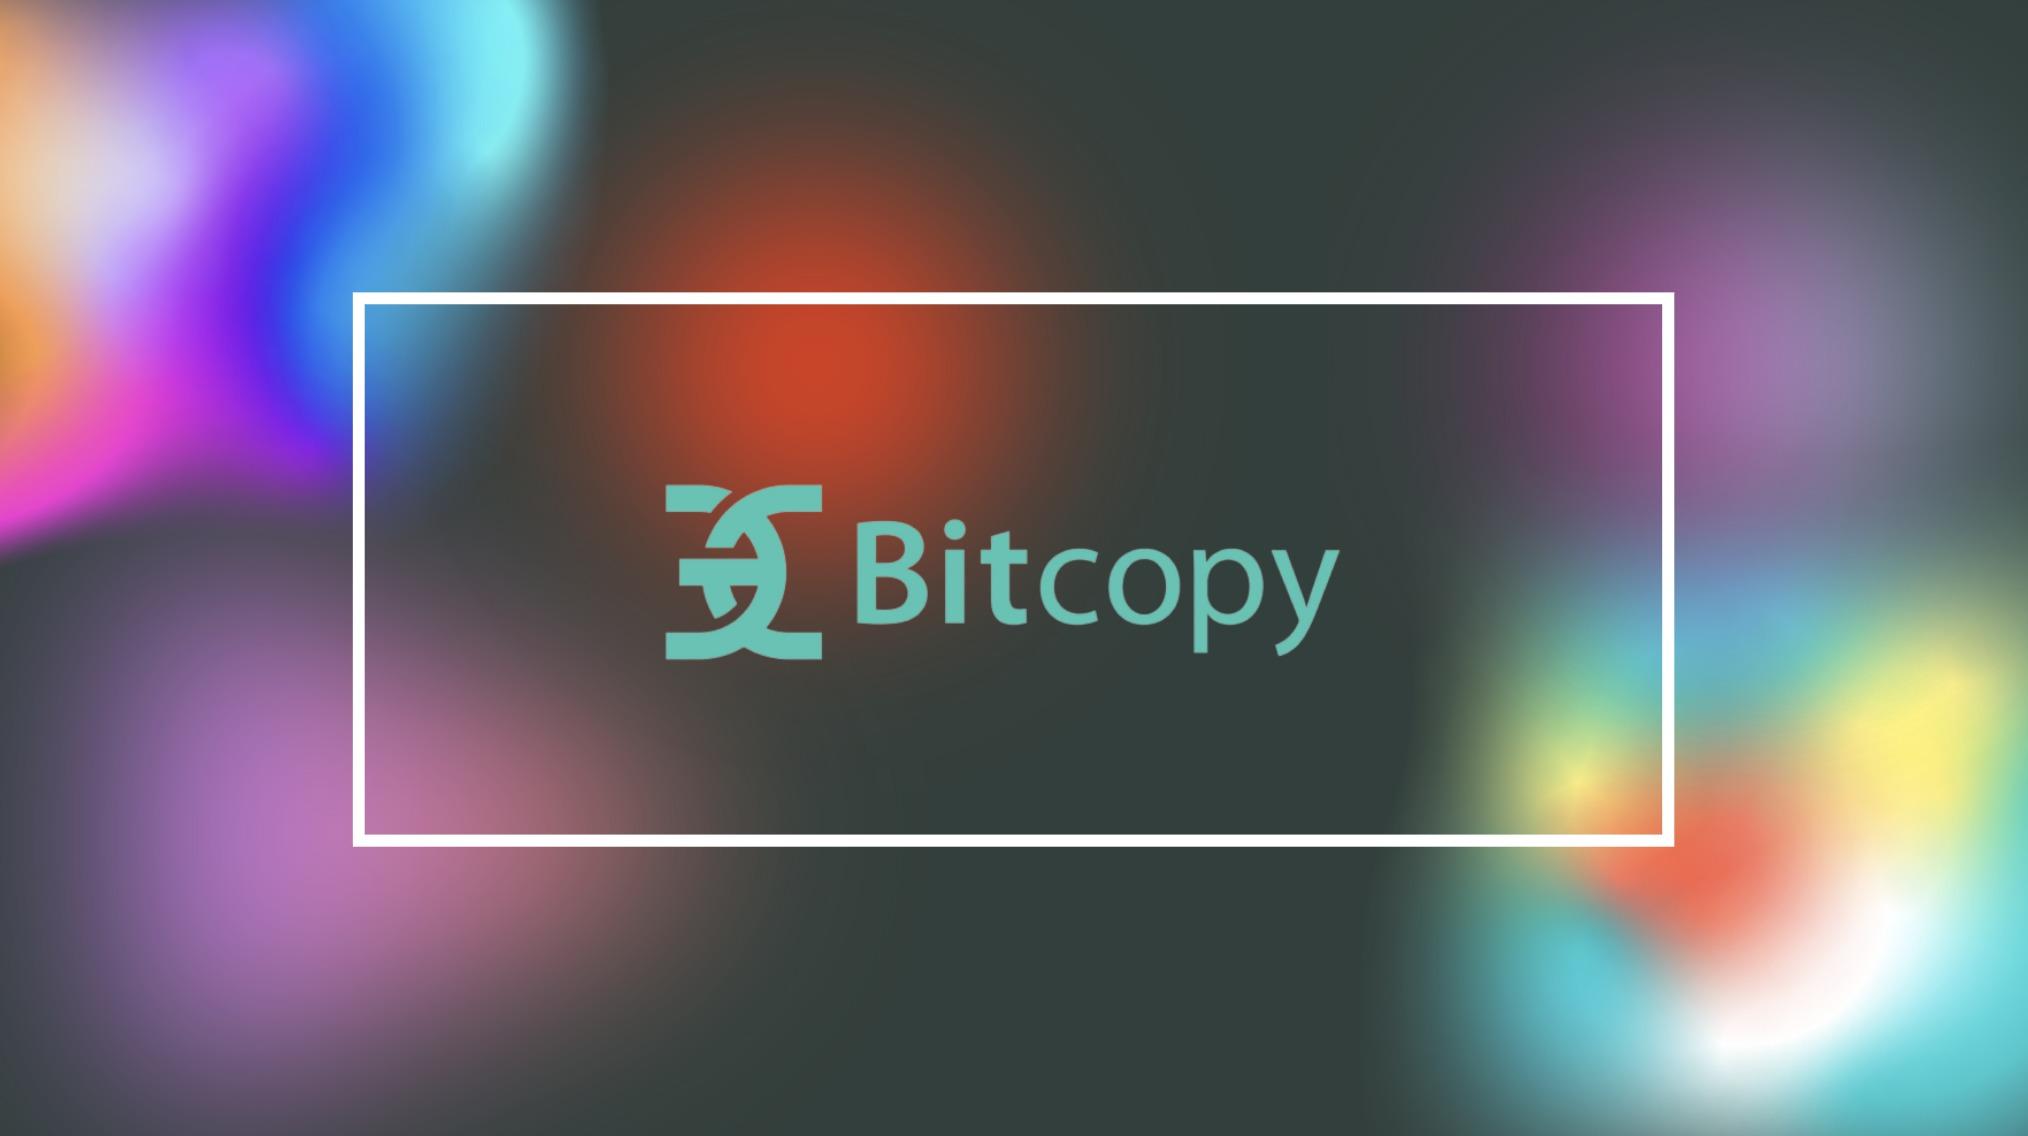 bybitやFTXと提携済み!?BitCopy(ビットコピー)の特徴や評判を徹底解説!